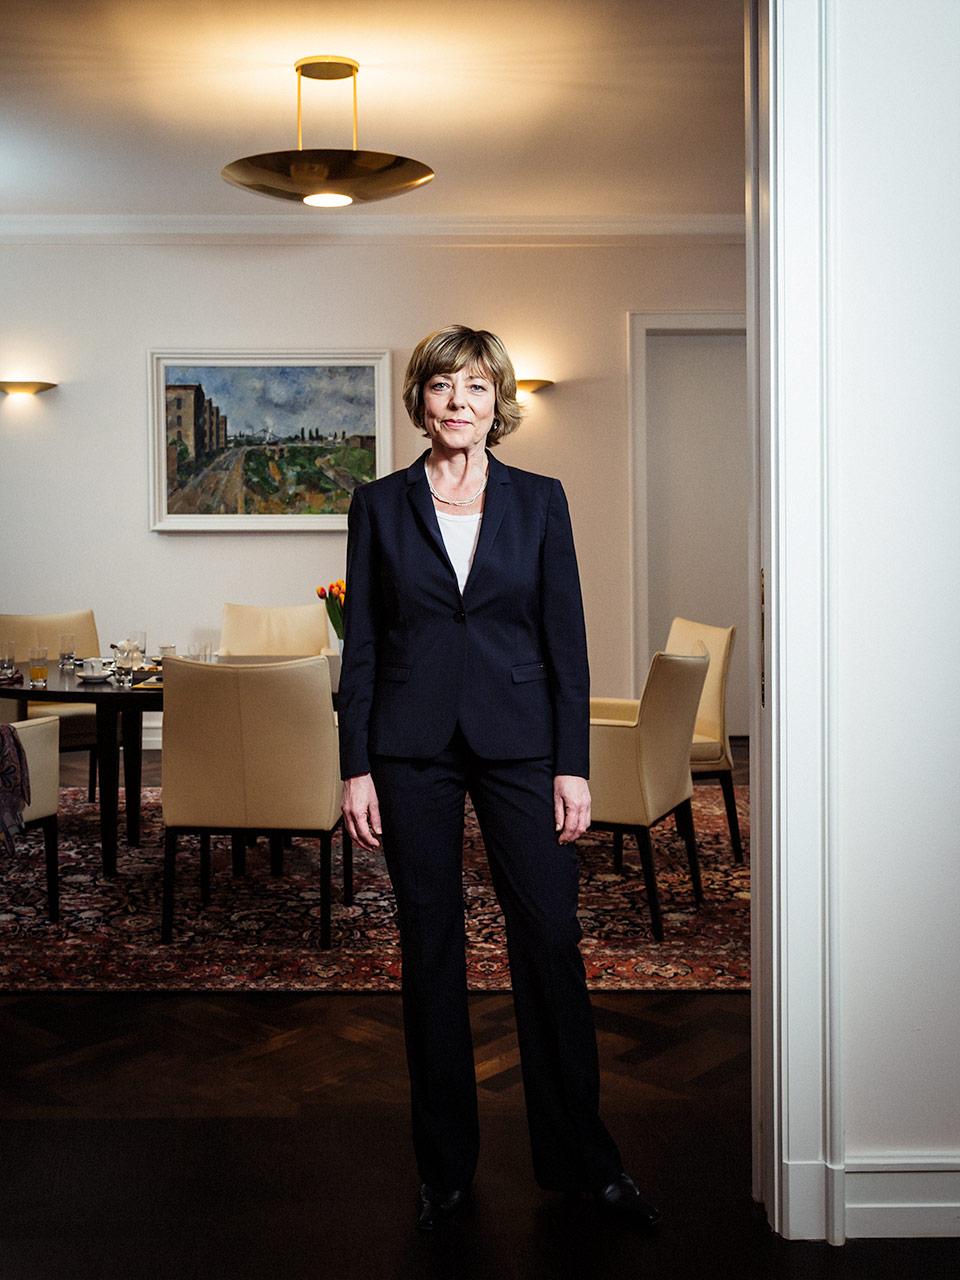 Daniela-Schadt-Lebensgefährin-Bundespräsident